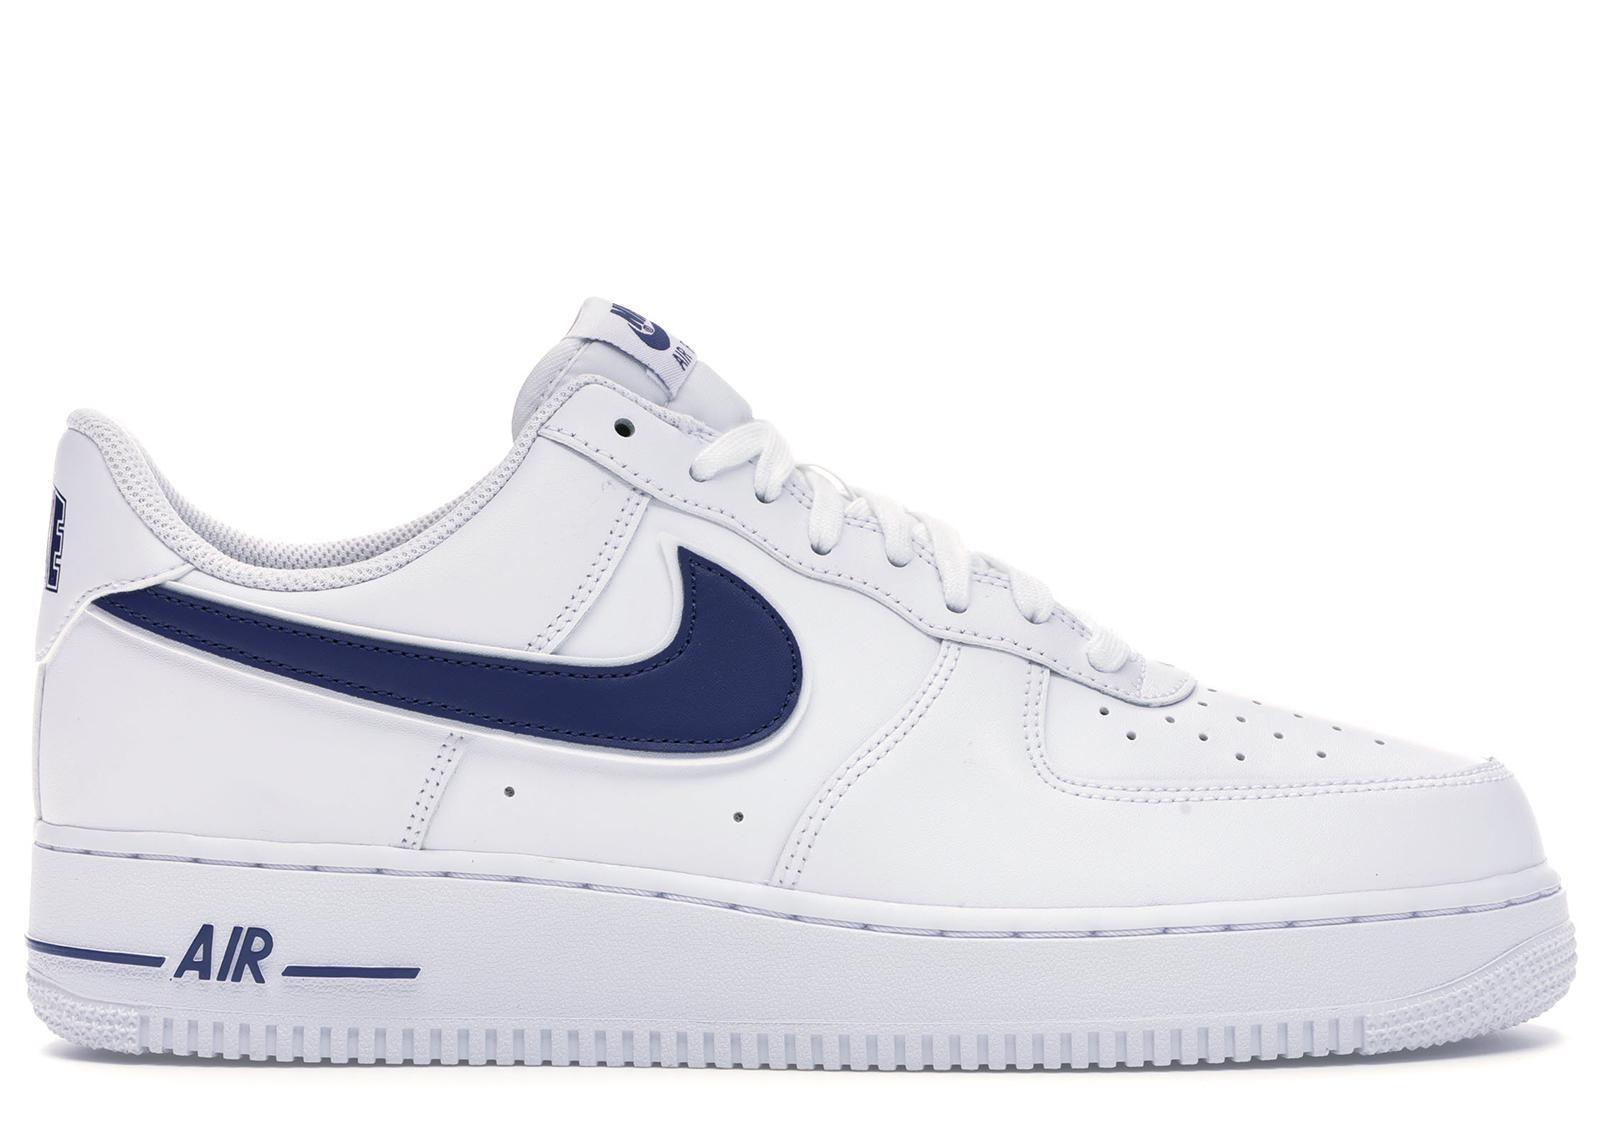 Air Force 1 Low White Deep Royal